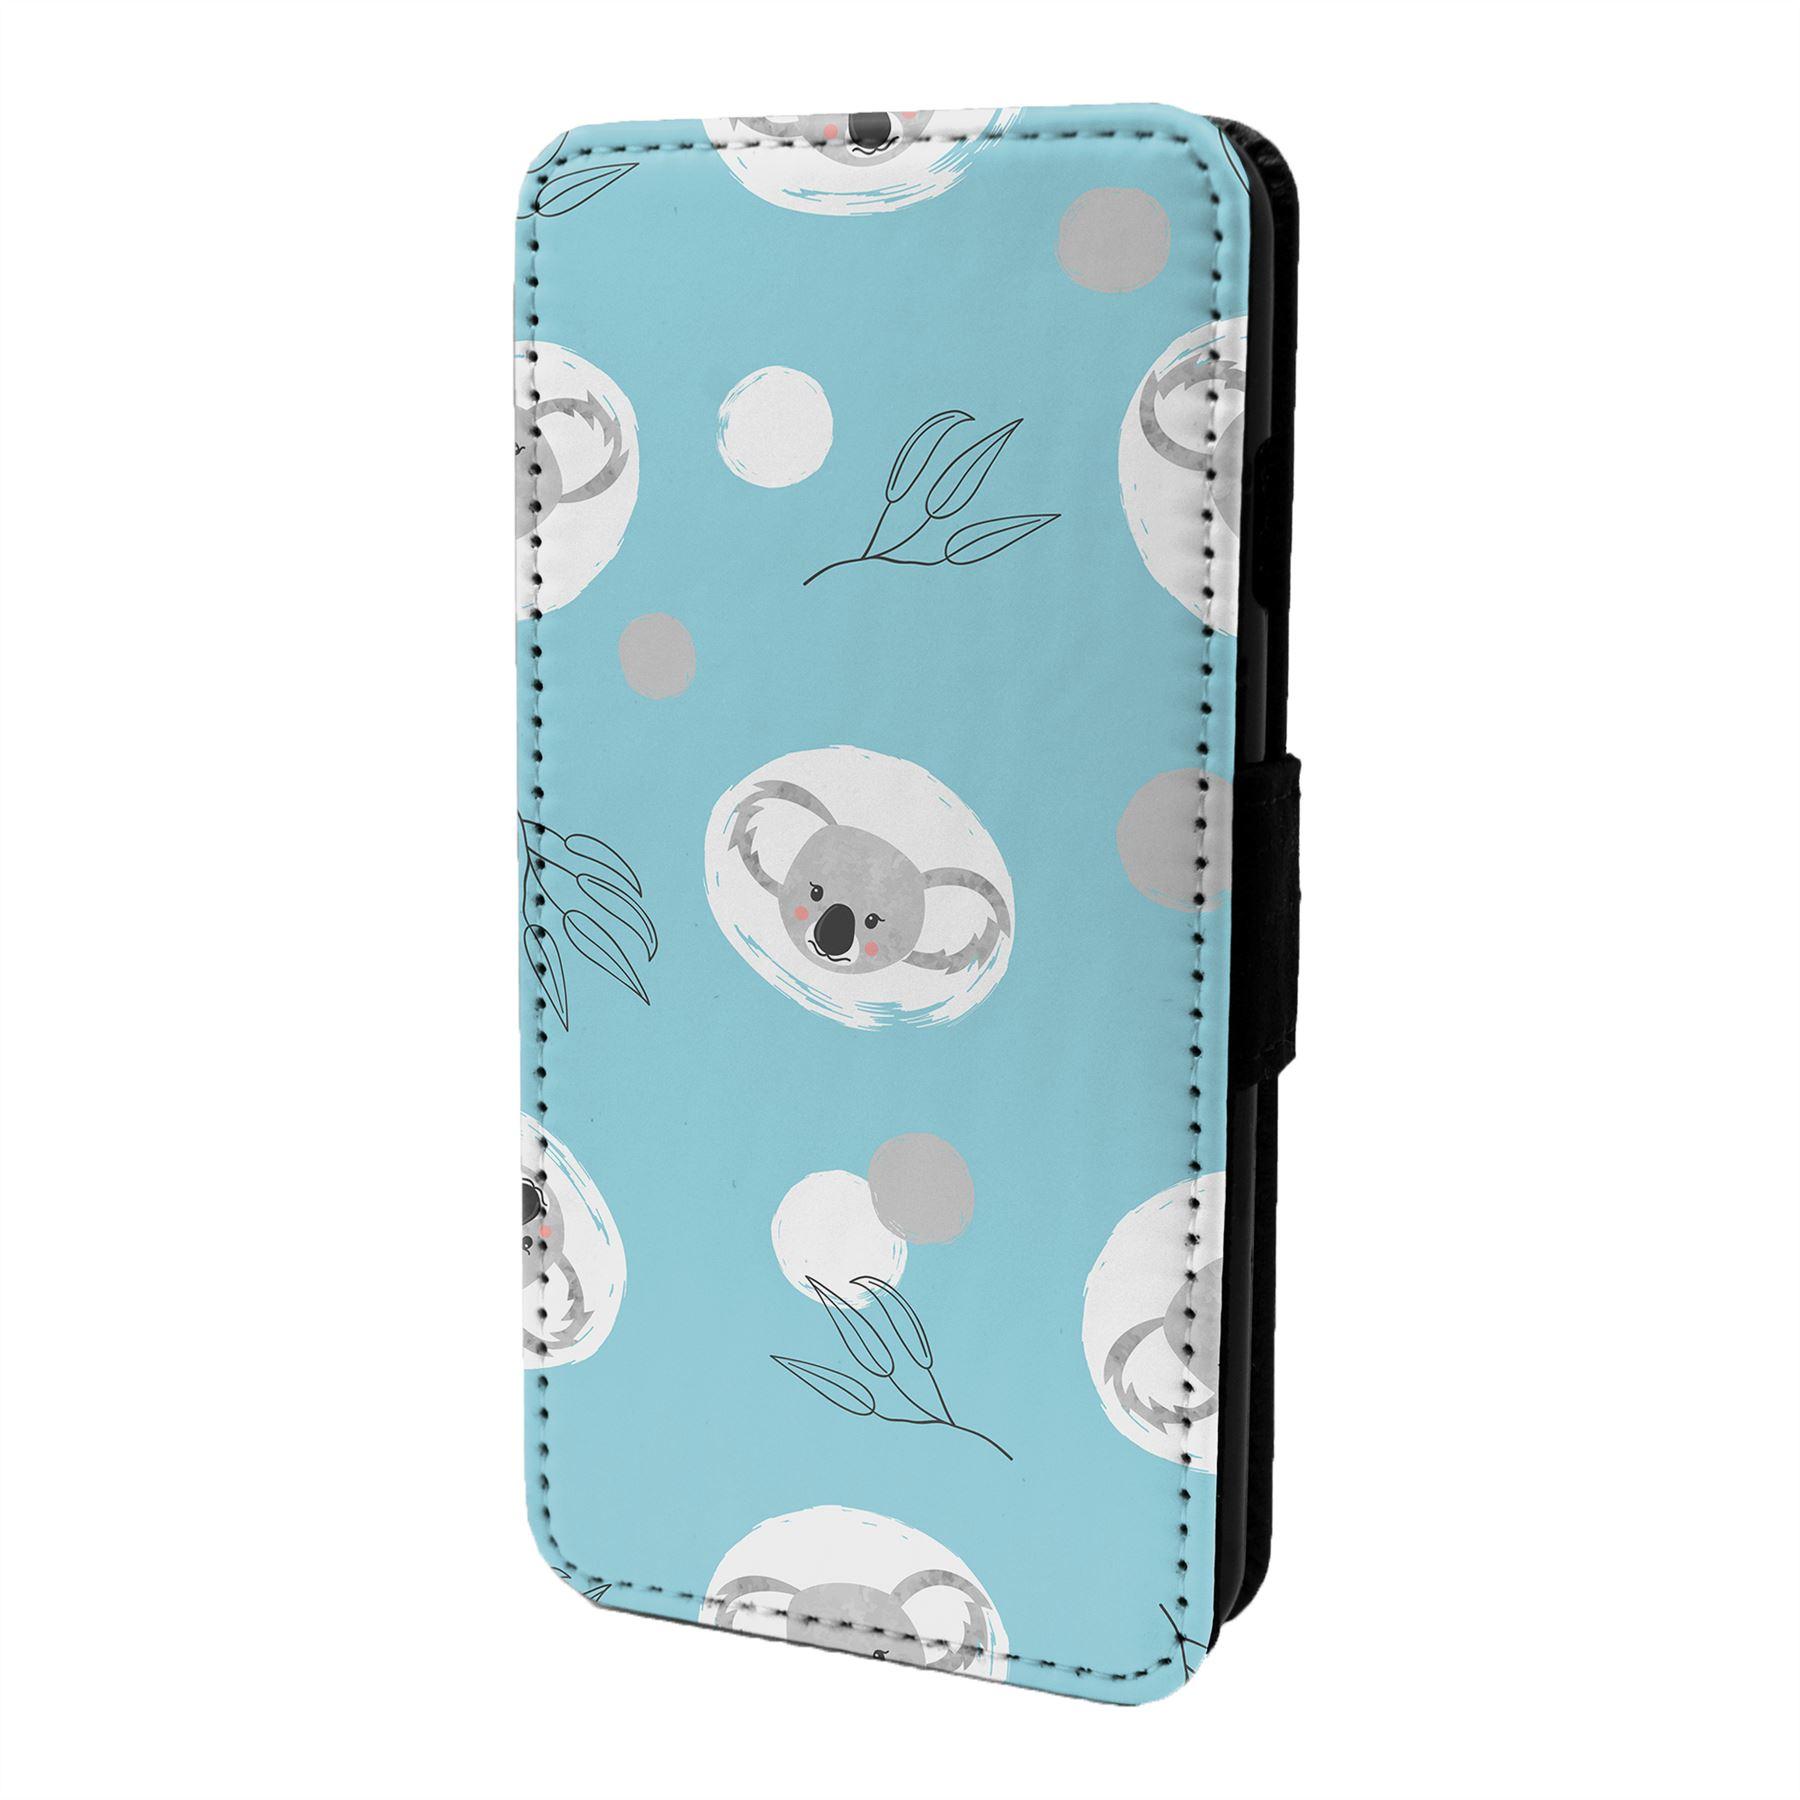 Koala-Motif-Etui-Rabattable-pour-Telephone-Portable-S6822